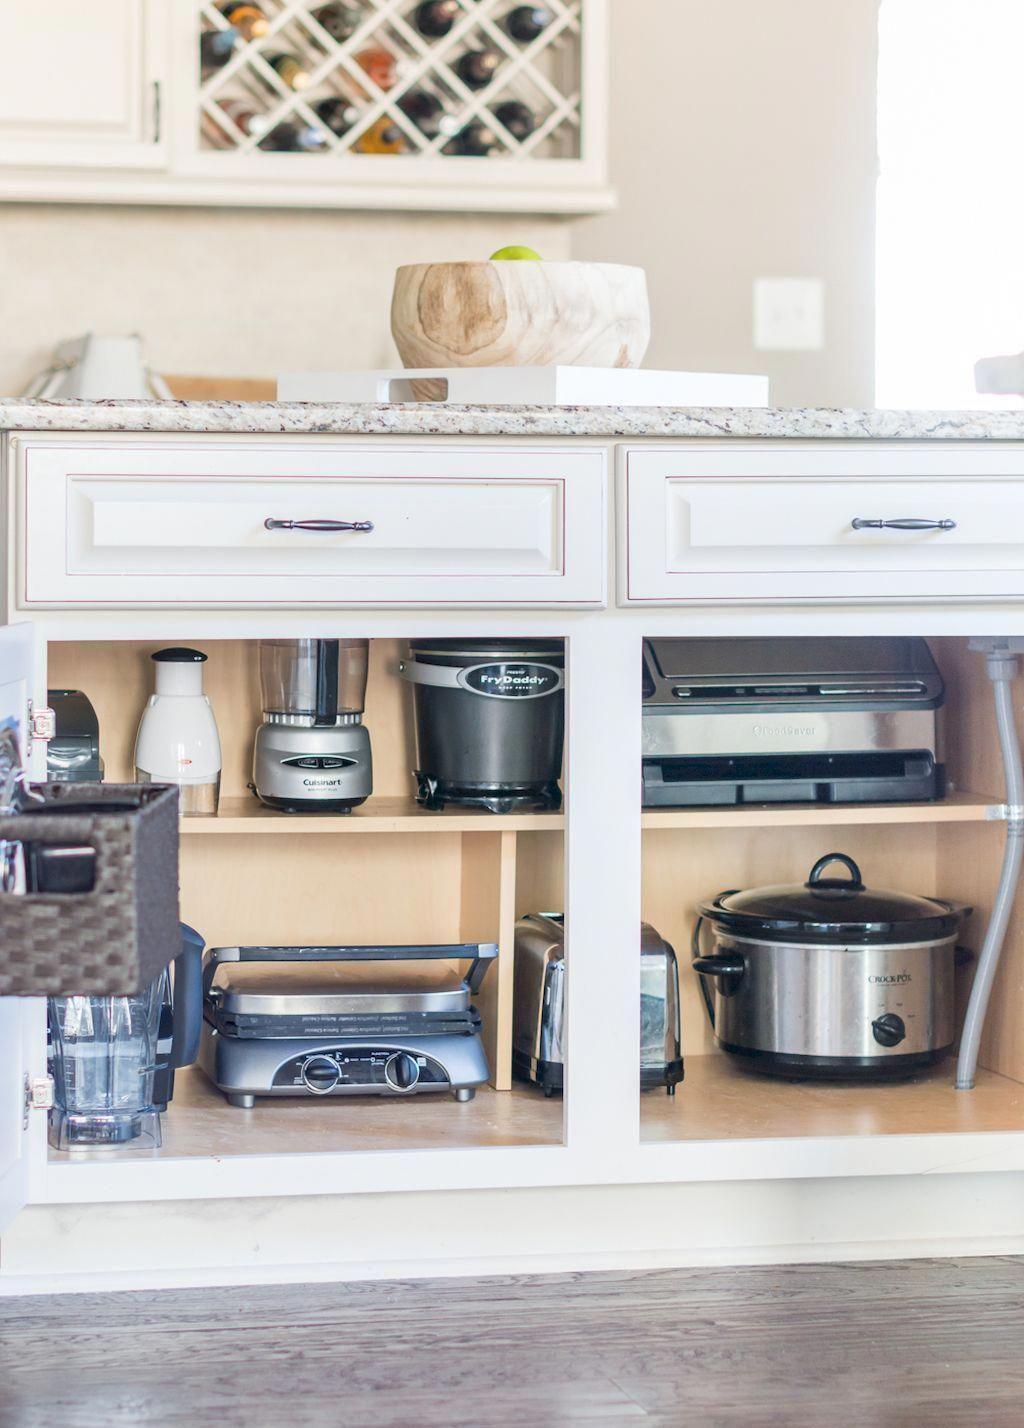 Kitchencabinetswhite Kitchen Appliances Organization New Kitchen Cabinets Small Kitchen Organization